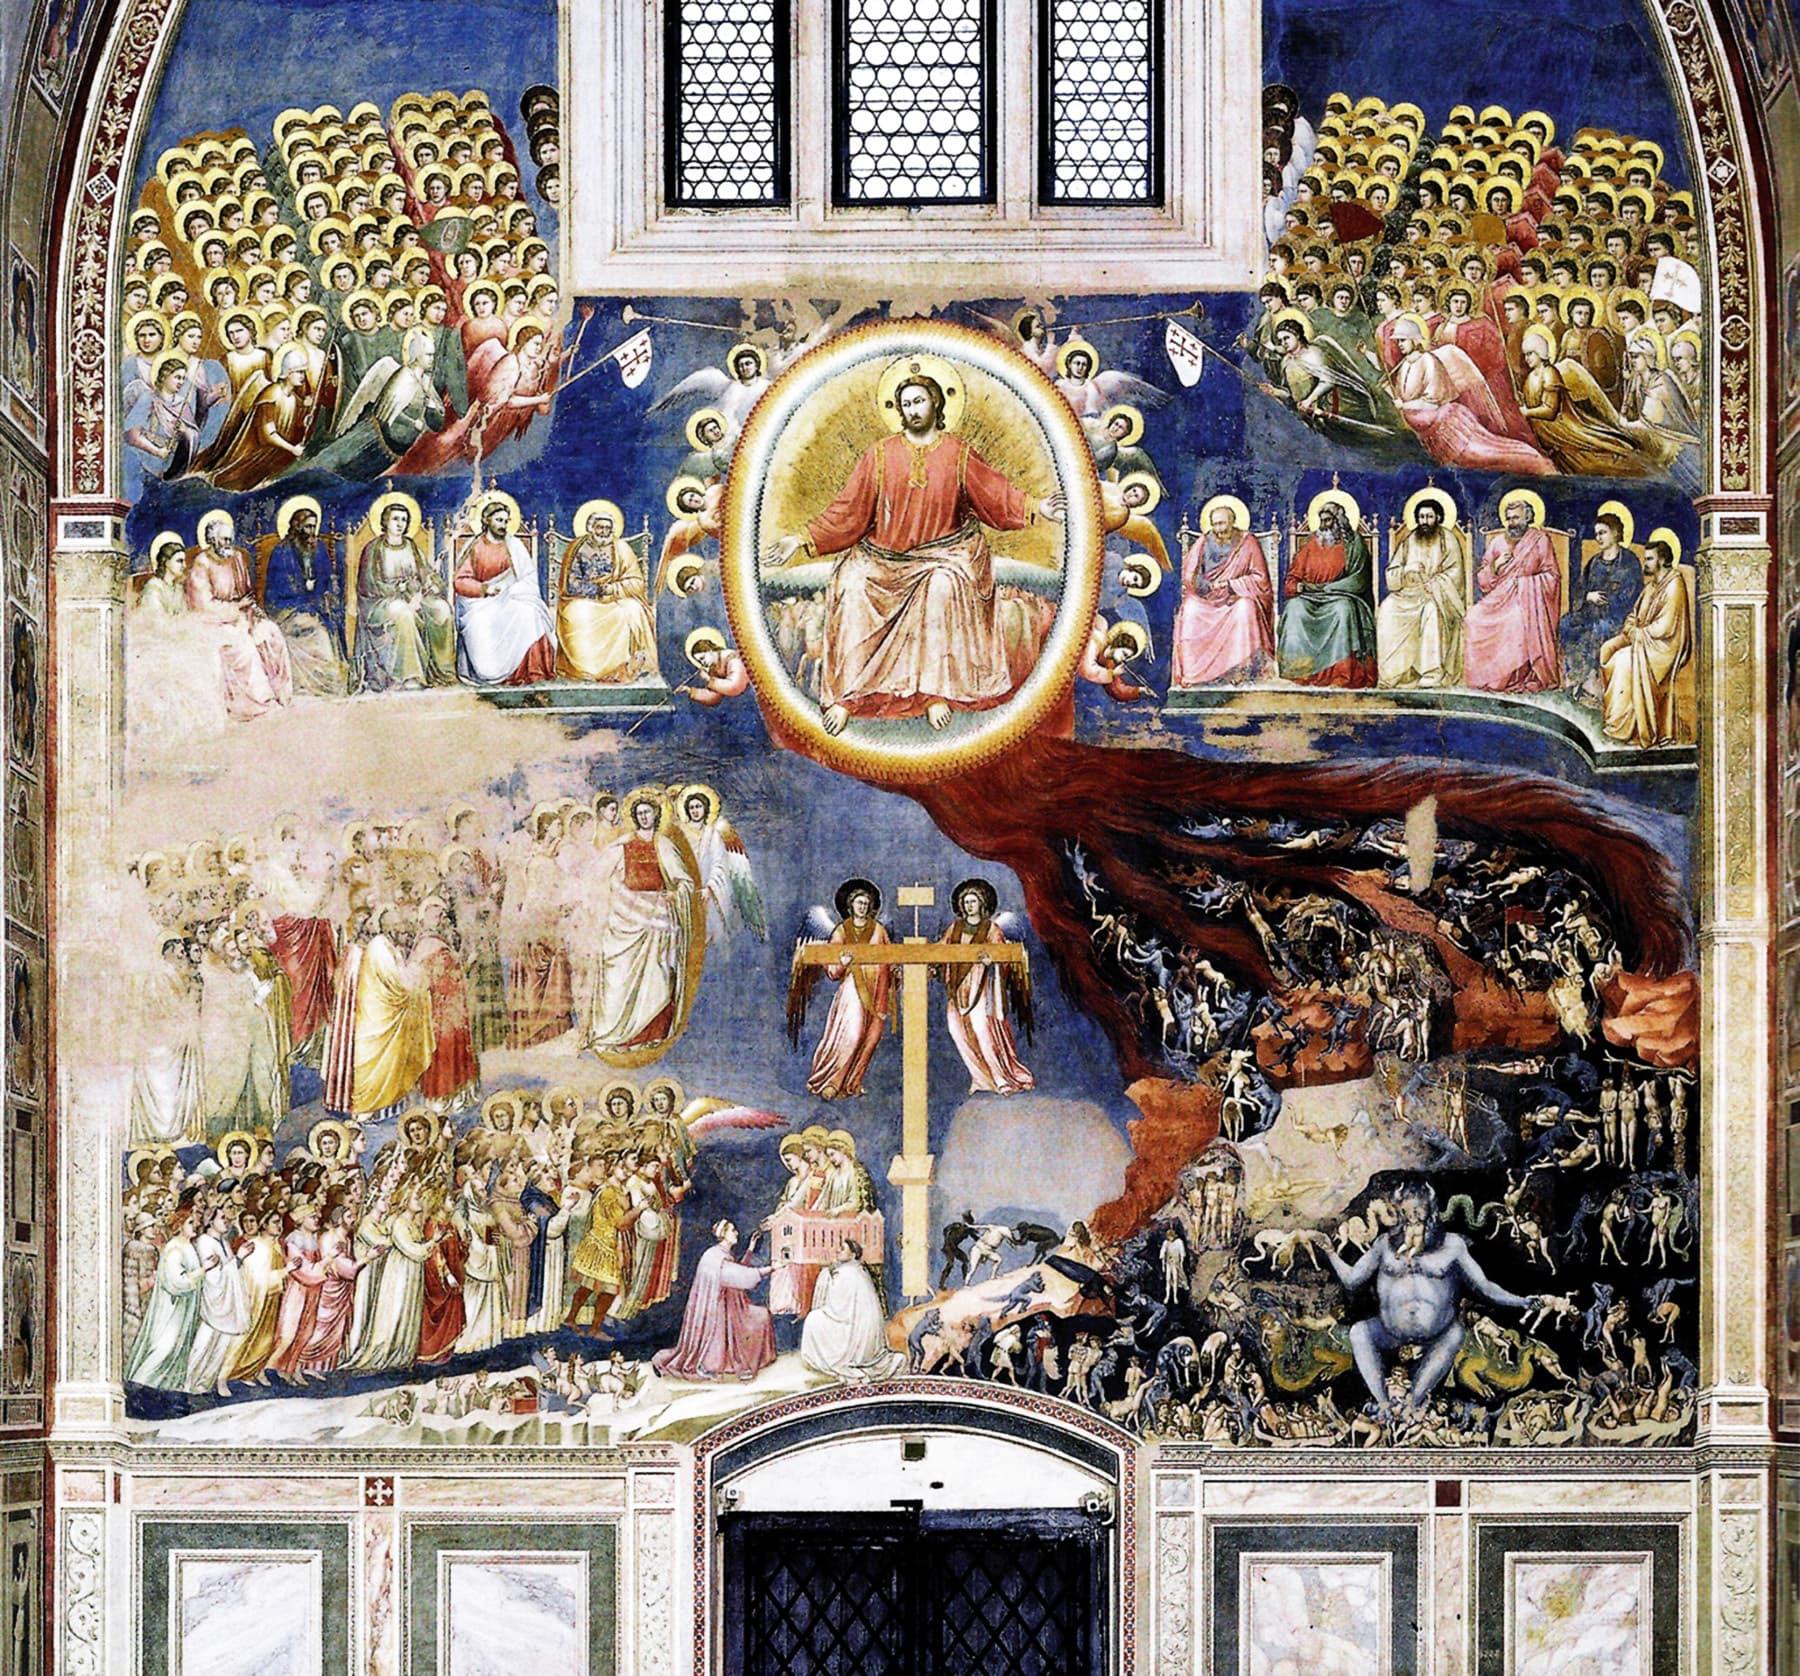 """روزِ قیامت کا منظر ""، جاٹو کی پینٹنگ(The last judgement)"